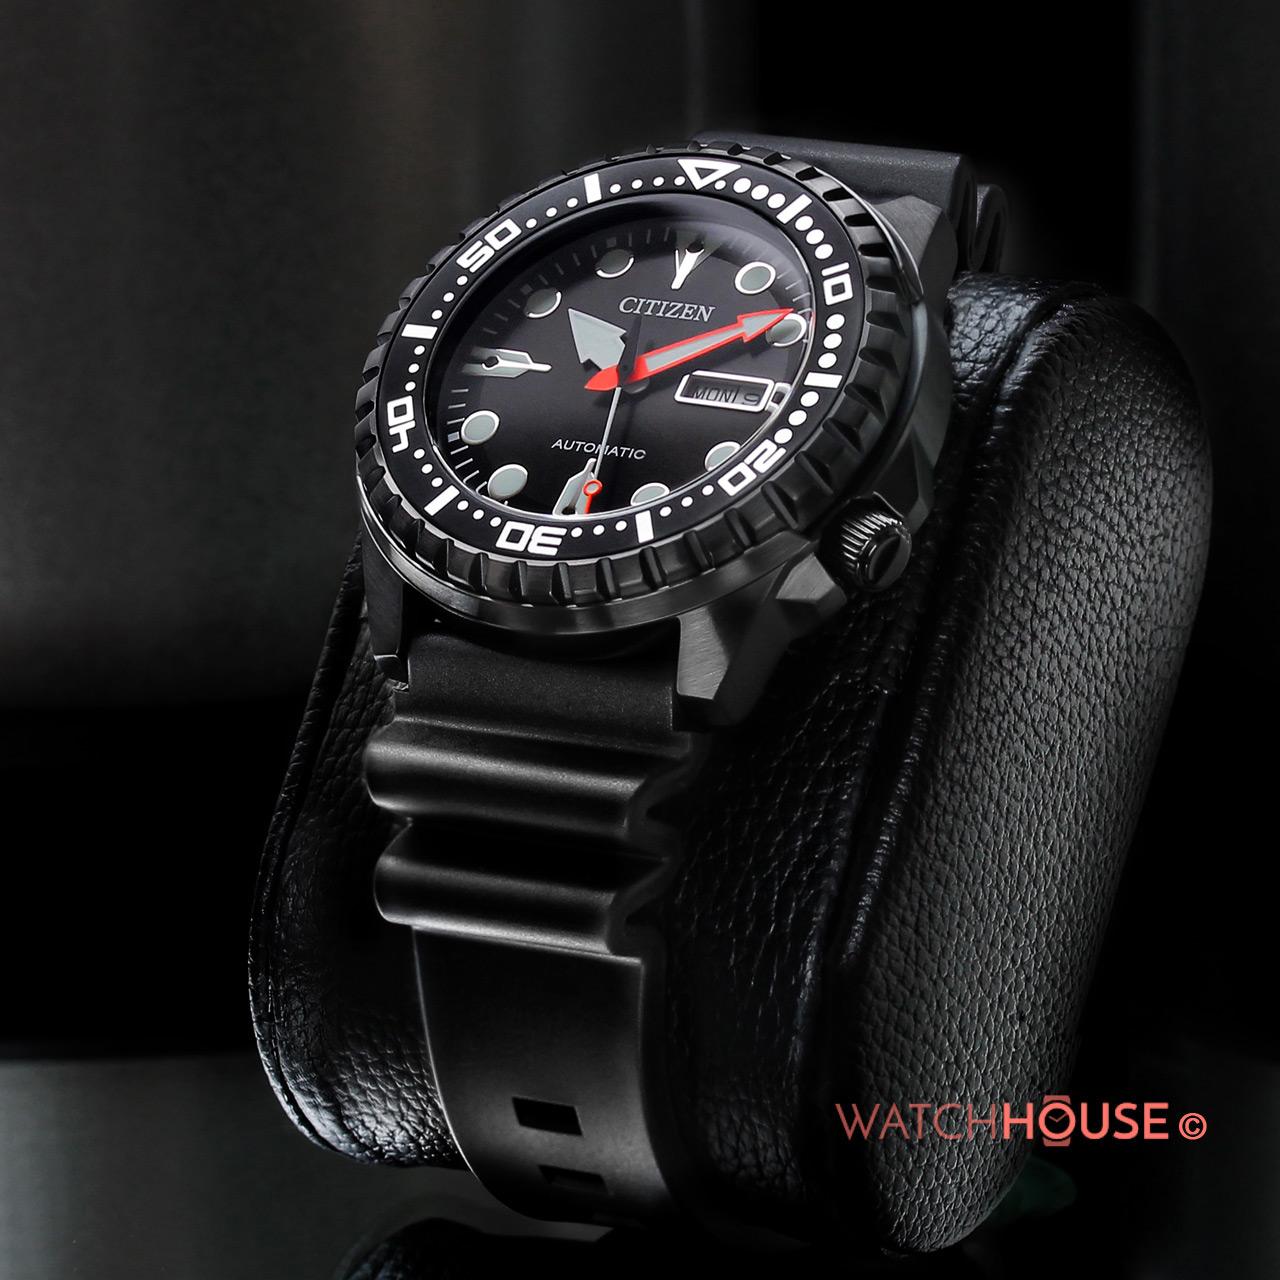 citizen sportuhr nh8385 11ee automatik herren armbanduhr. Black Bedroom Furniture Sets. Home Design Ideas